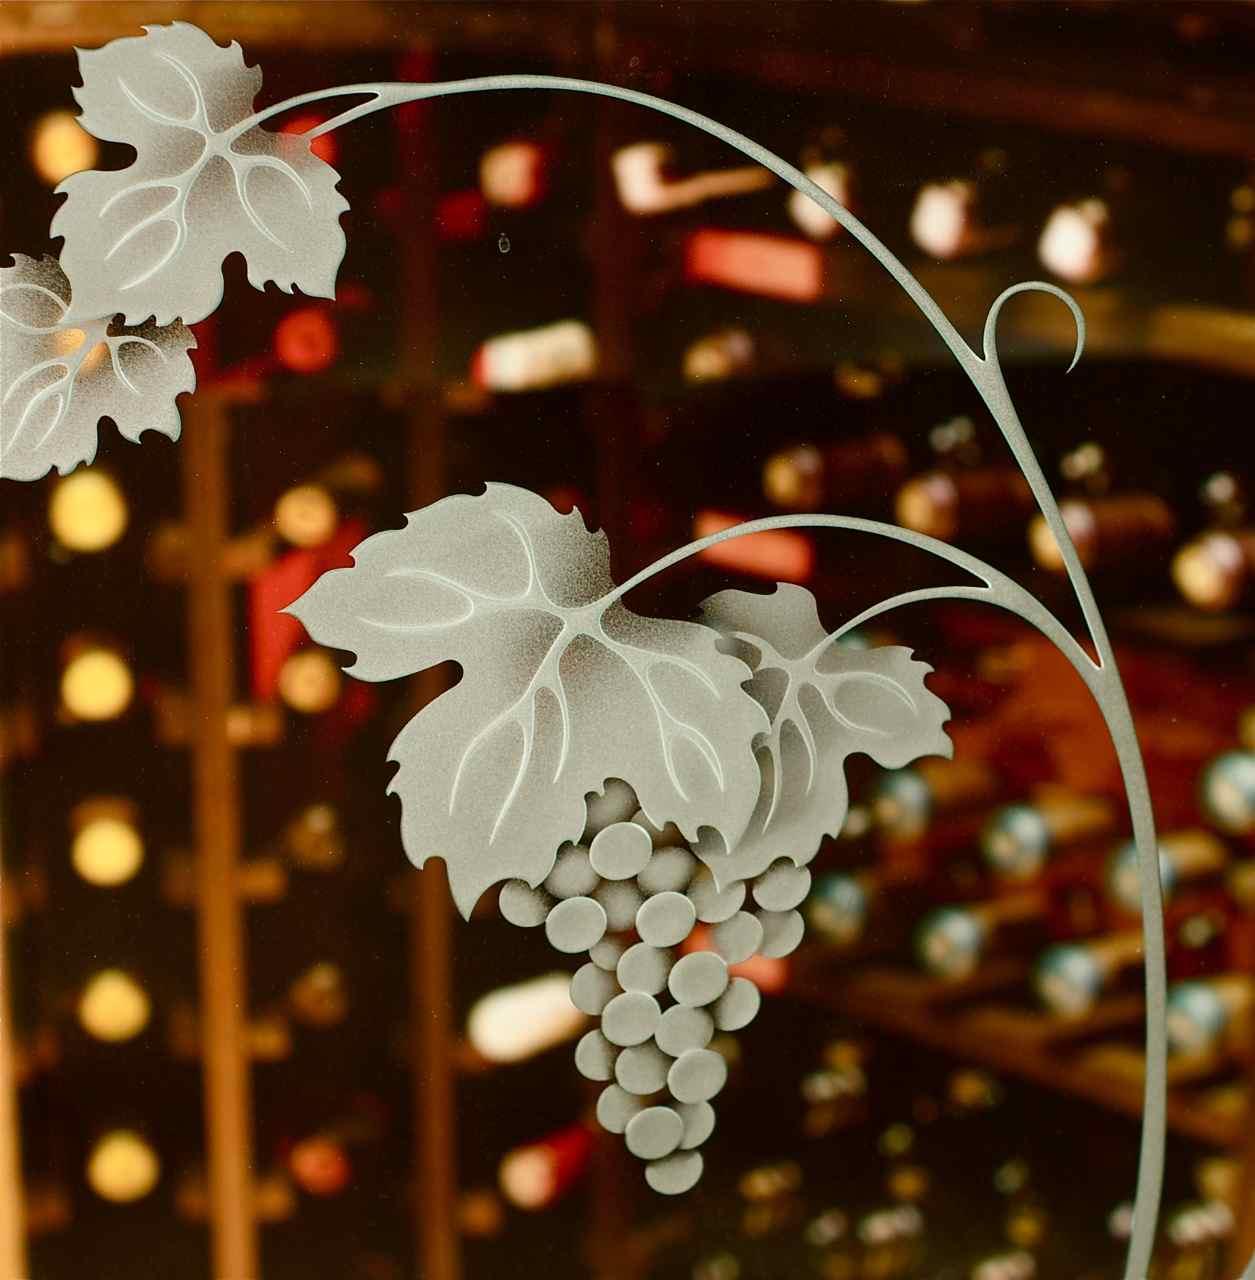 Sans Soucie Etched Glass Wine Room Door On Hgtv Sans Soucie